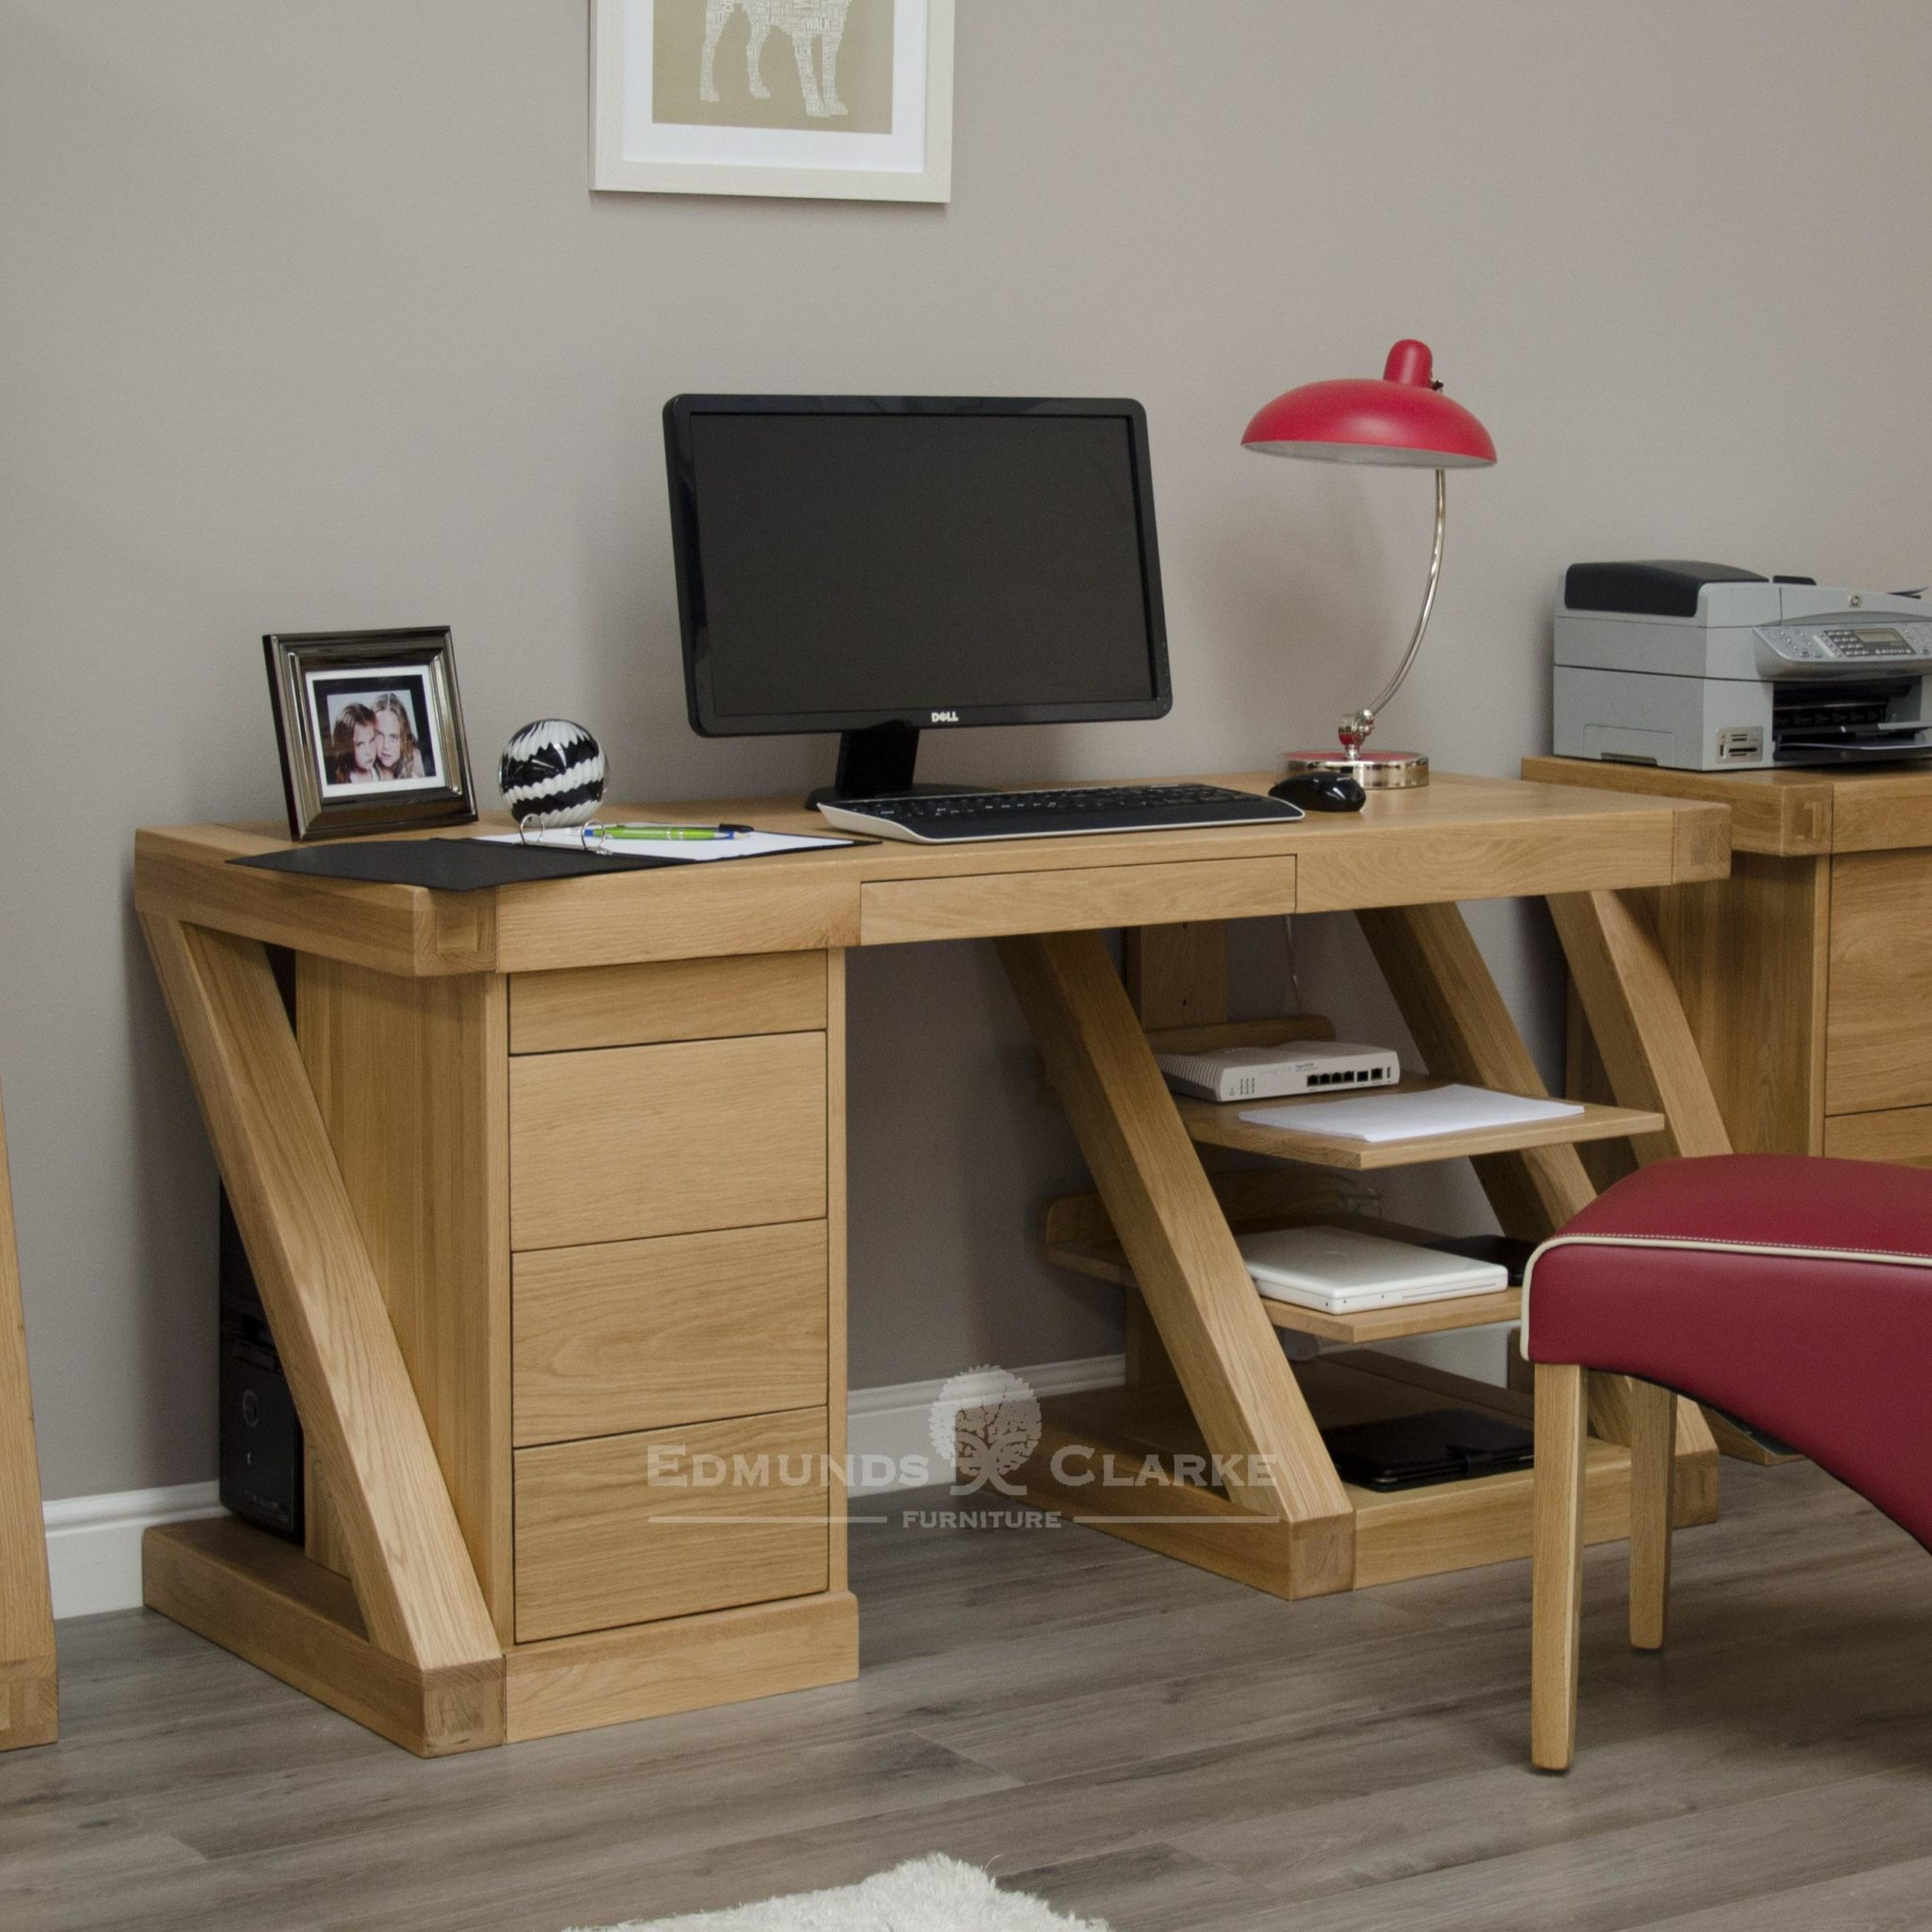 Z designer solid oak large computer desk with drawers and shelving ZCDL